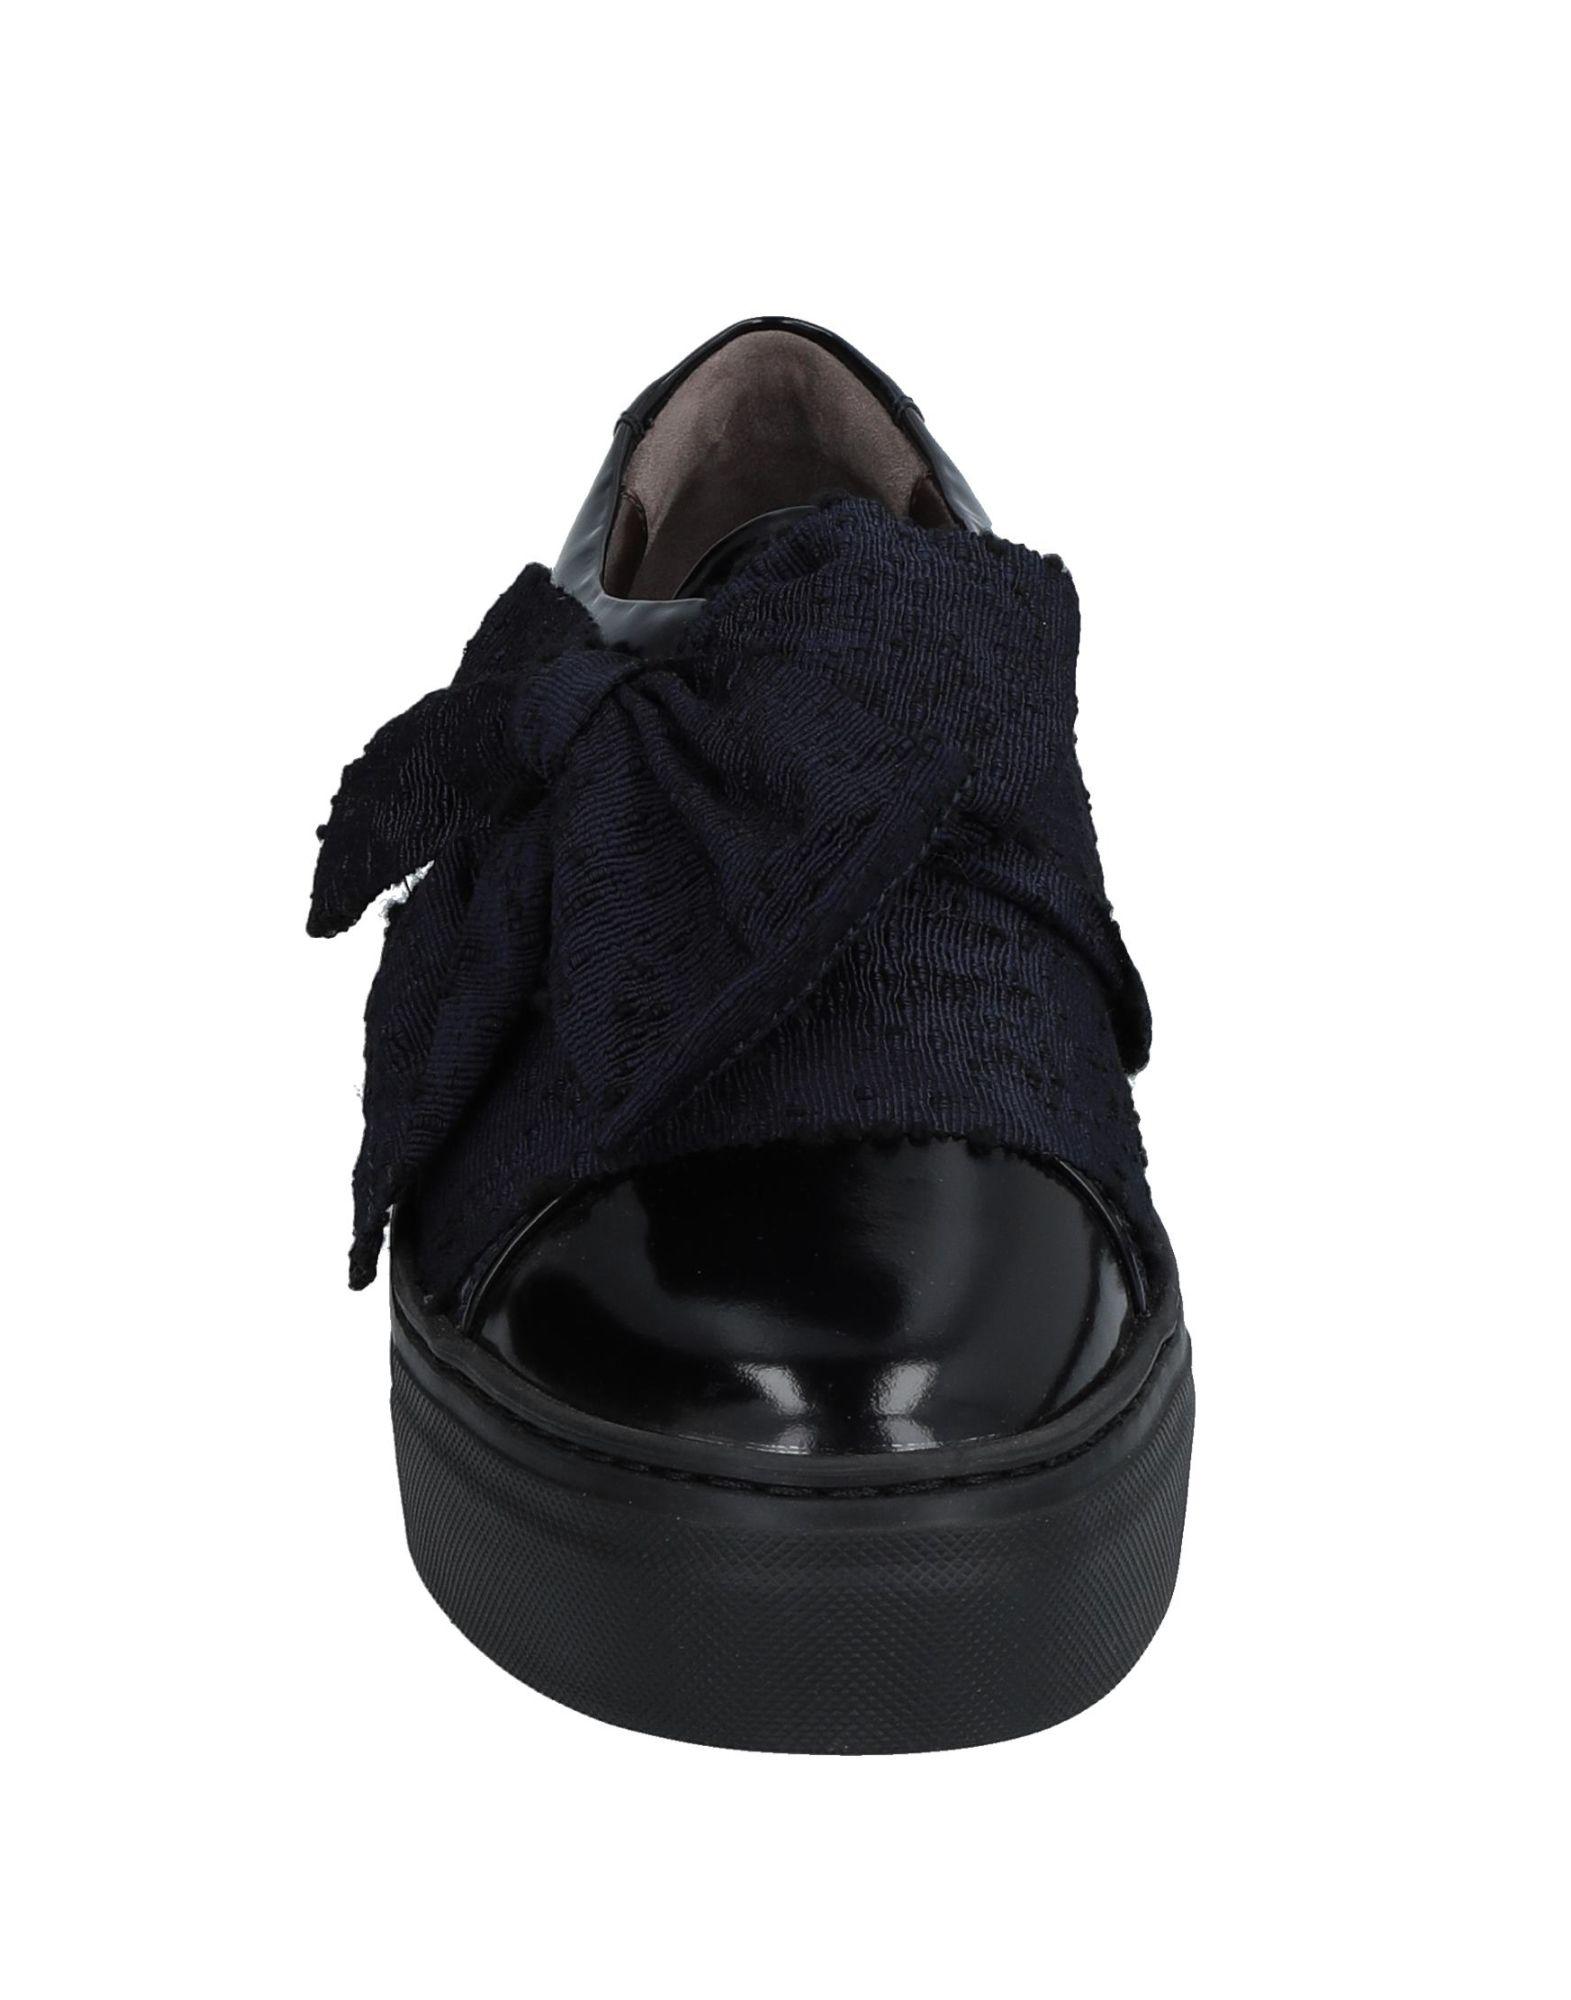 Stilvolle billige Schuhe Agl Attilio  Giusti Leombruni Sneakers Damen  Attilio 11536097XK bee717